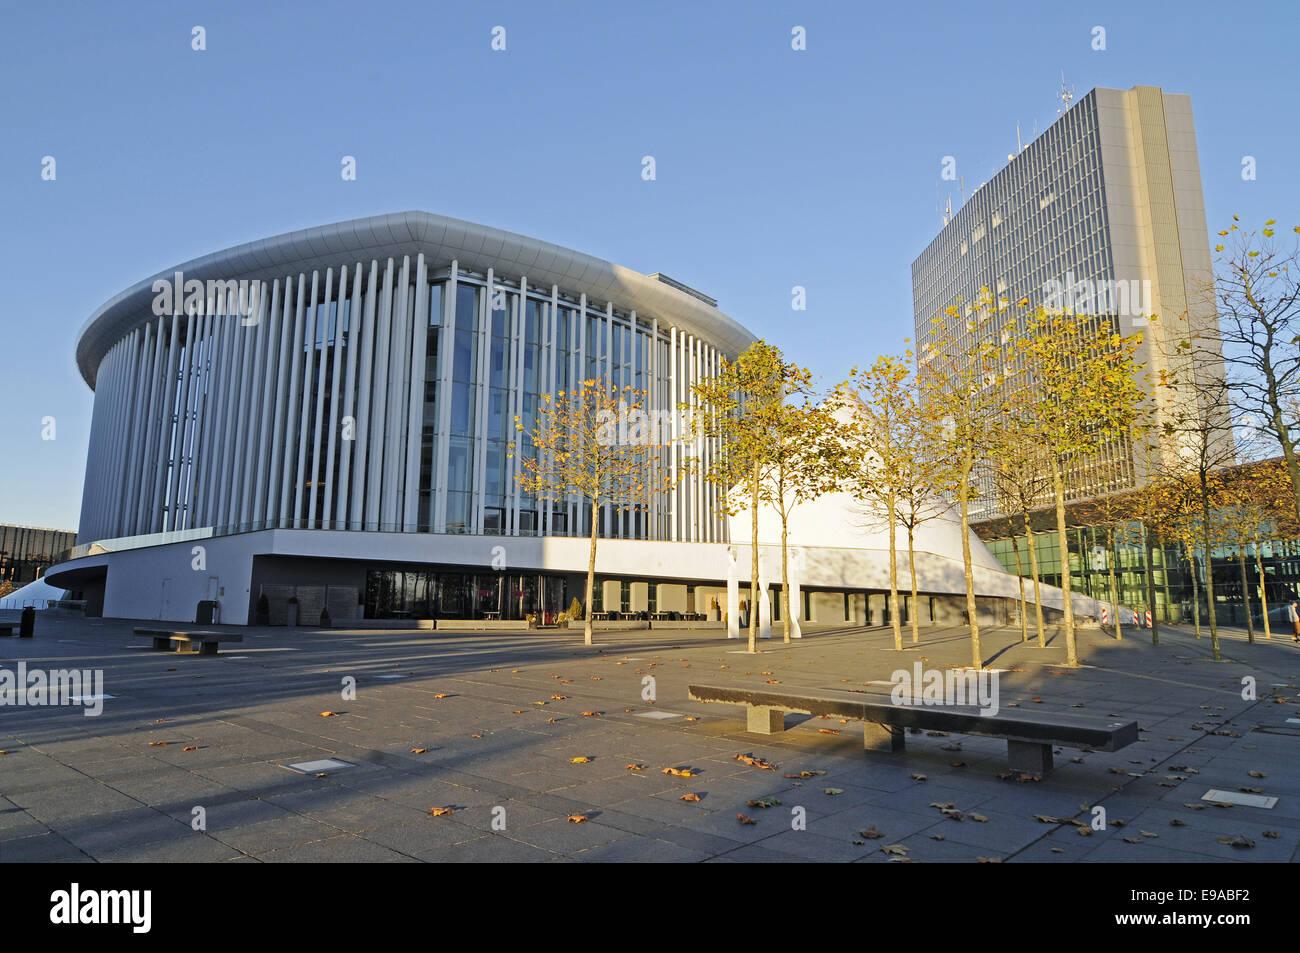 philharmonic hall, Kirchberg area, Luxembourg - Stock Image